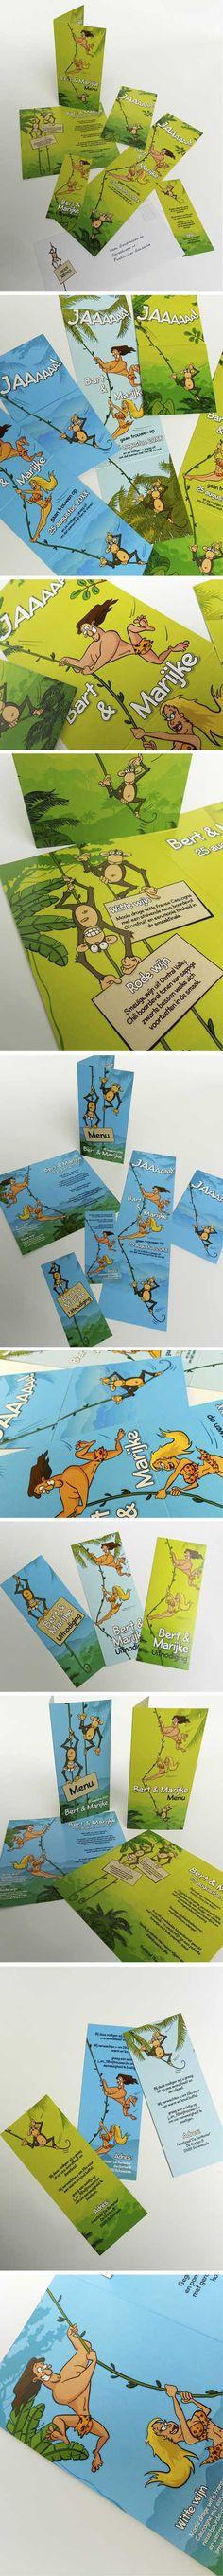 Exotisch & grappig: #trouwkaart Tarzan & Jane